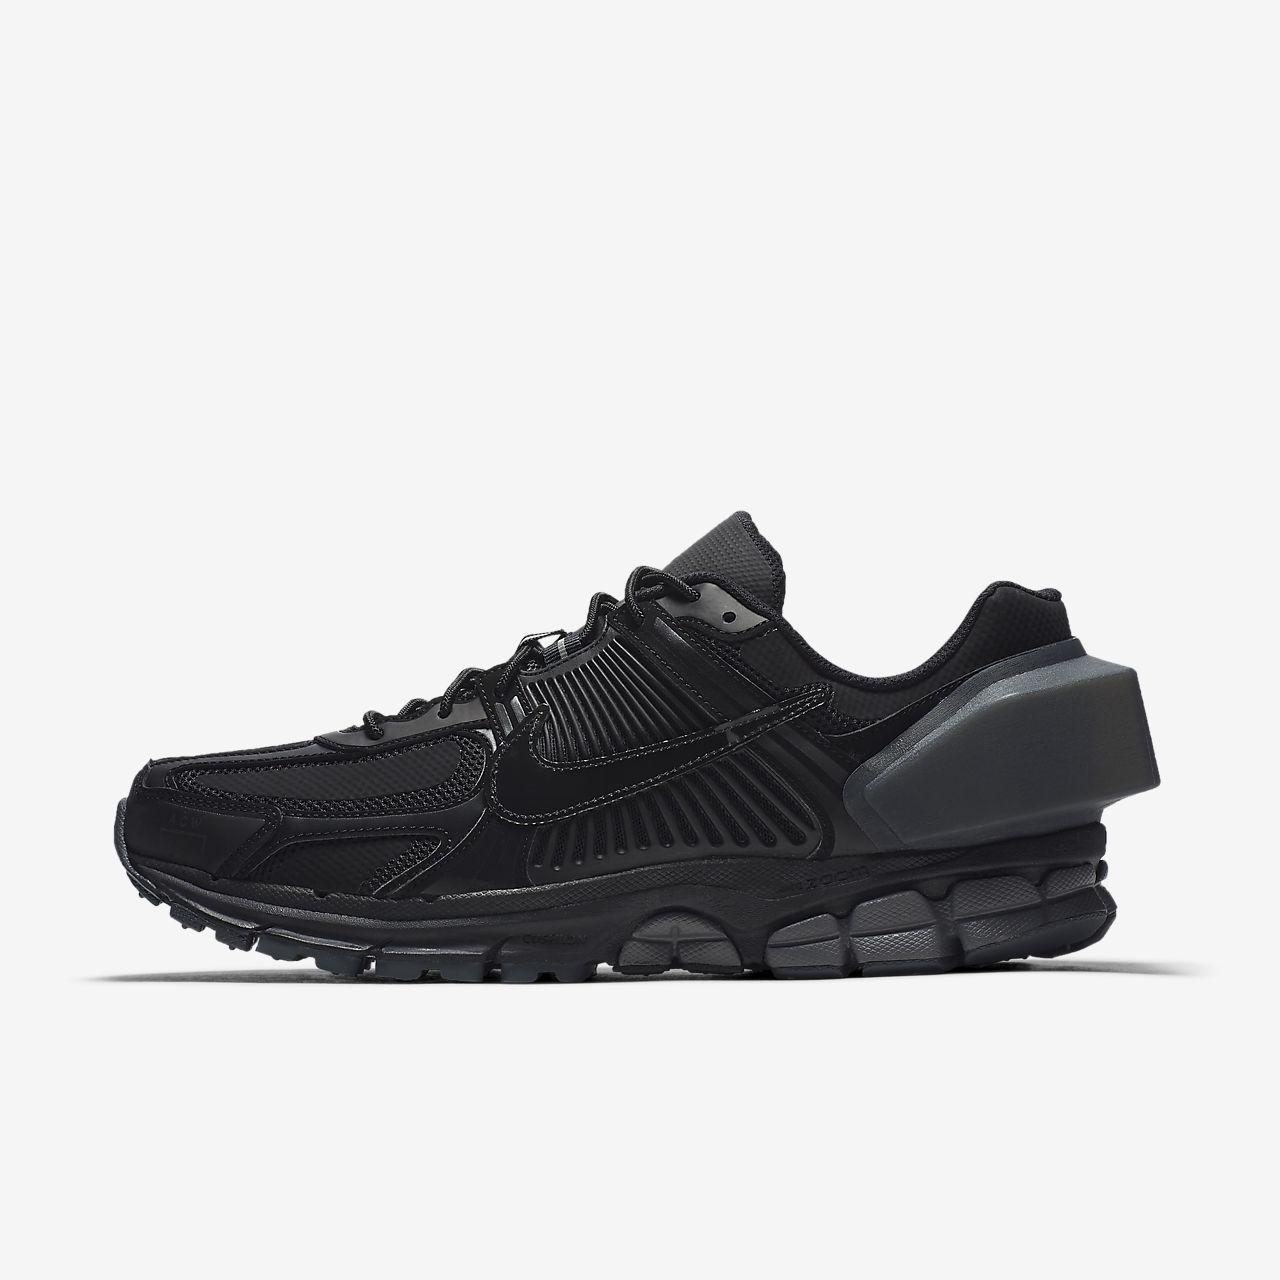 9481ccd130c7 Nike x A-COLD-WALL  Zoom Vomero +5 Zapatillas. Nike.com ES